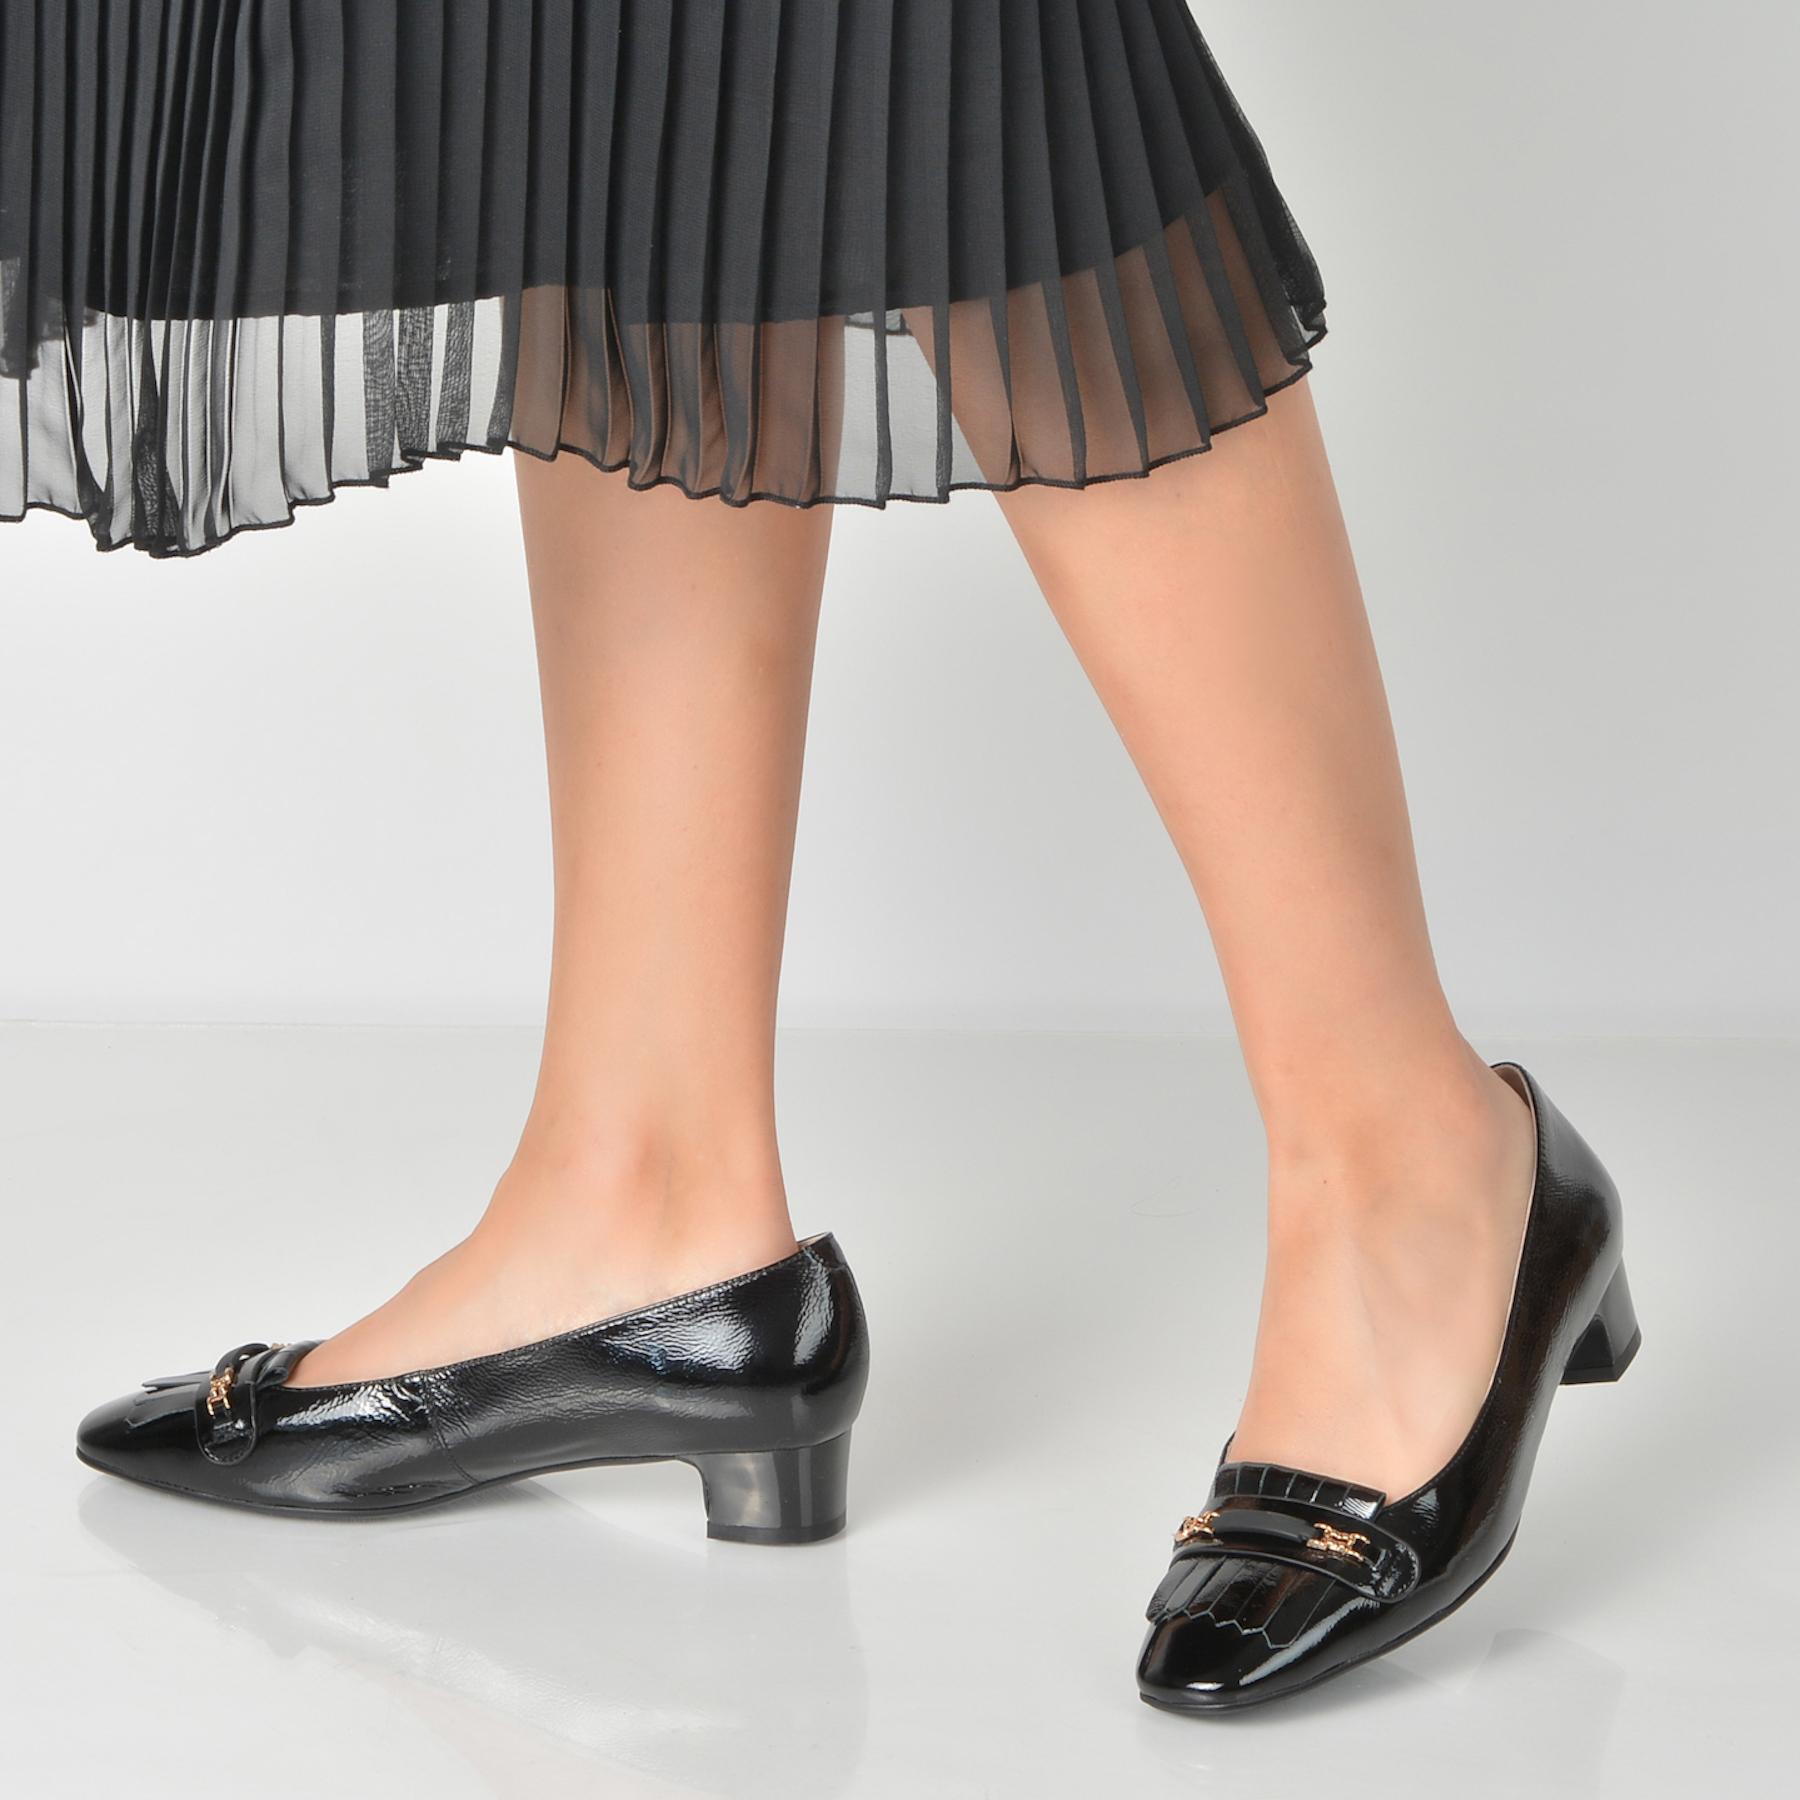 Pantofi Flavia Passini Negri, 72058, Din Piele Naturala Lacuita